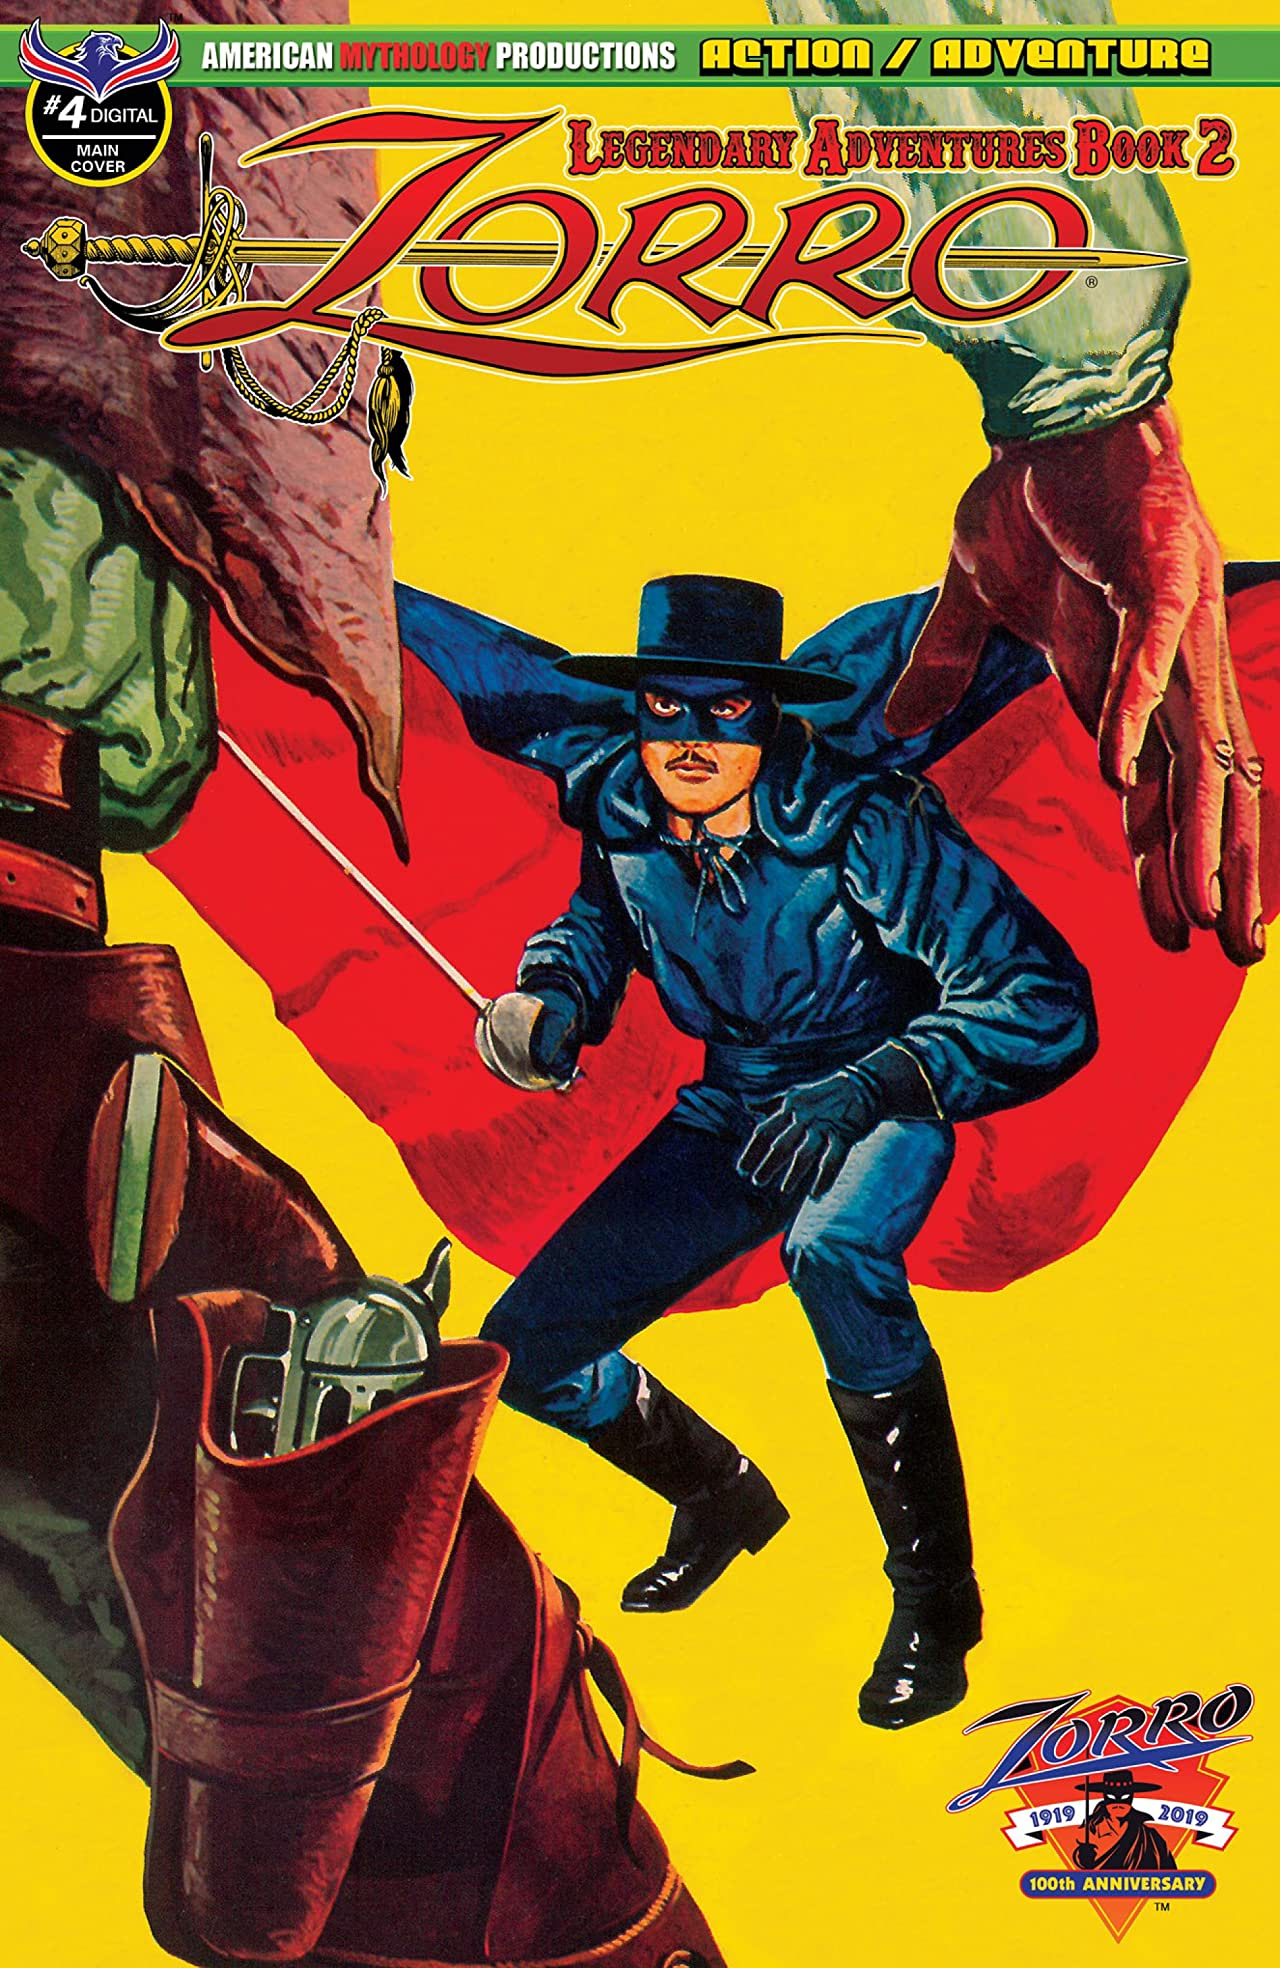 Zorro: Legendary Adventures Book 2 #4